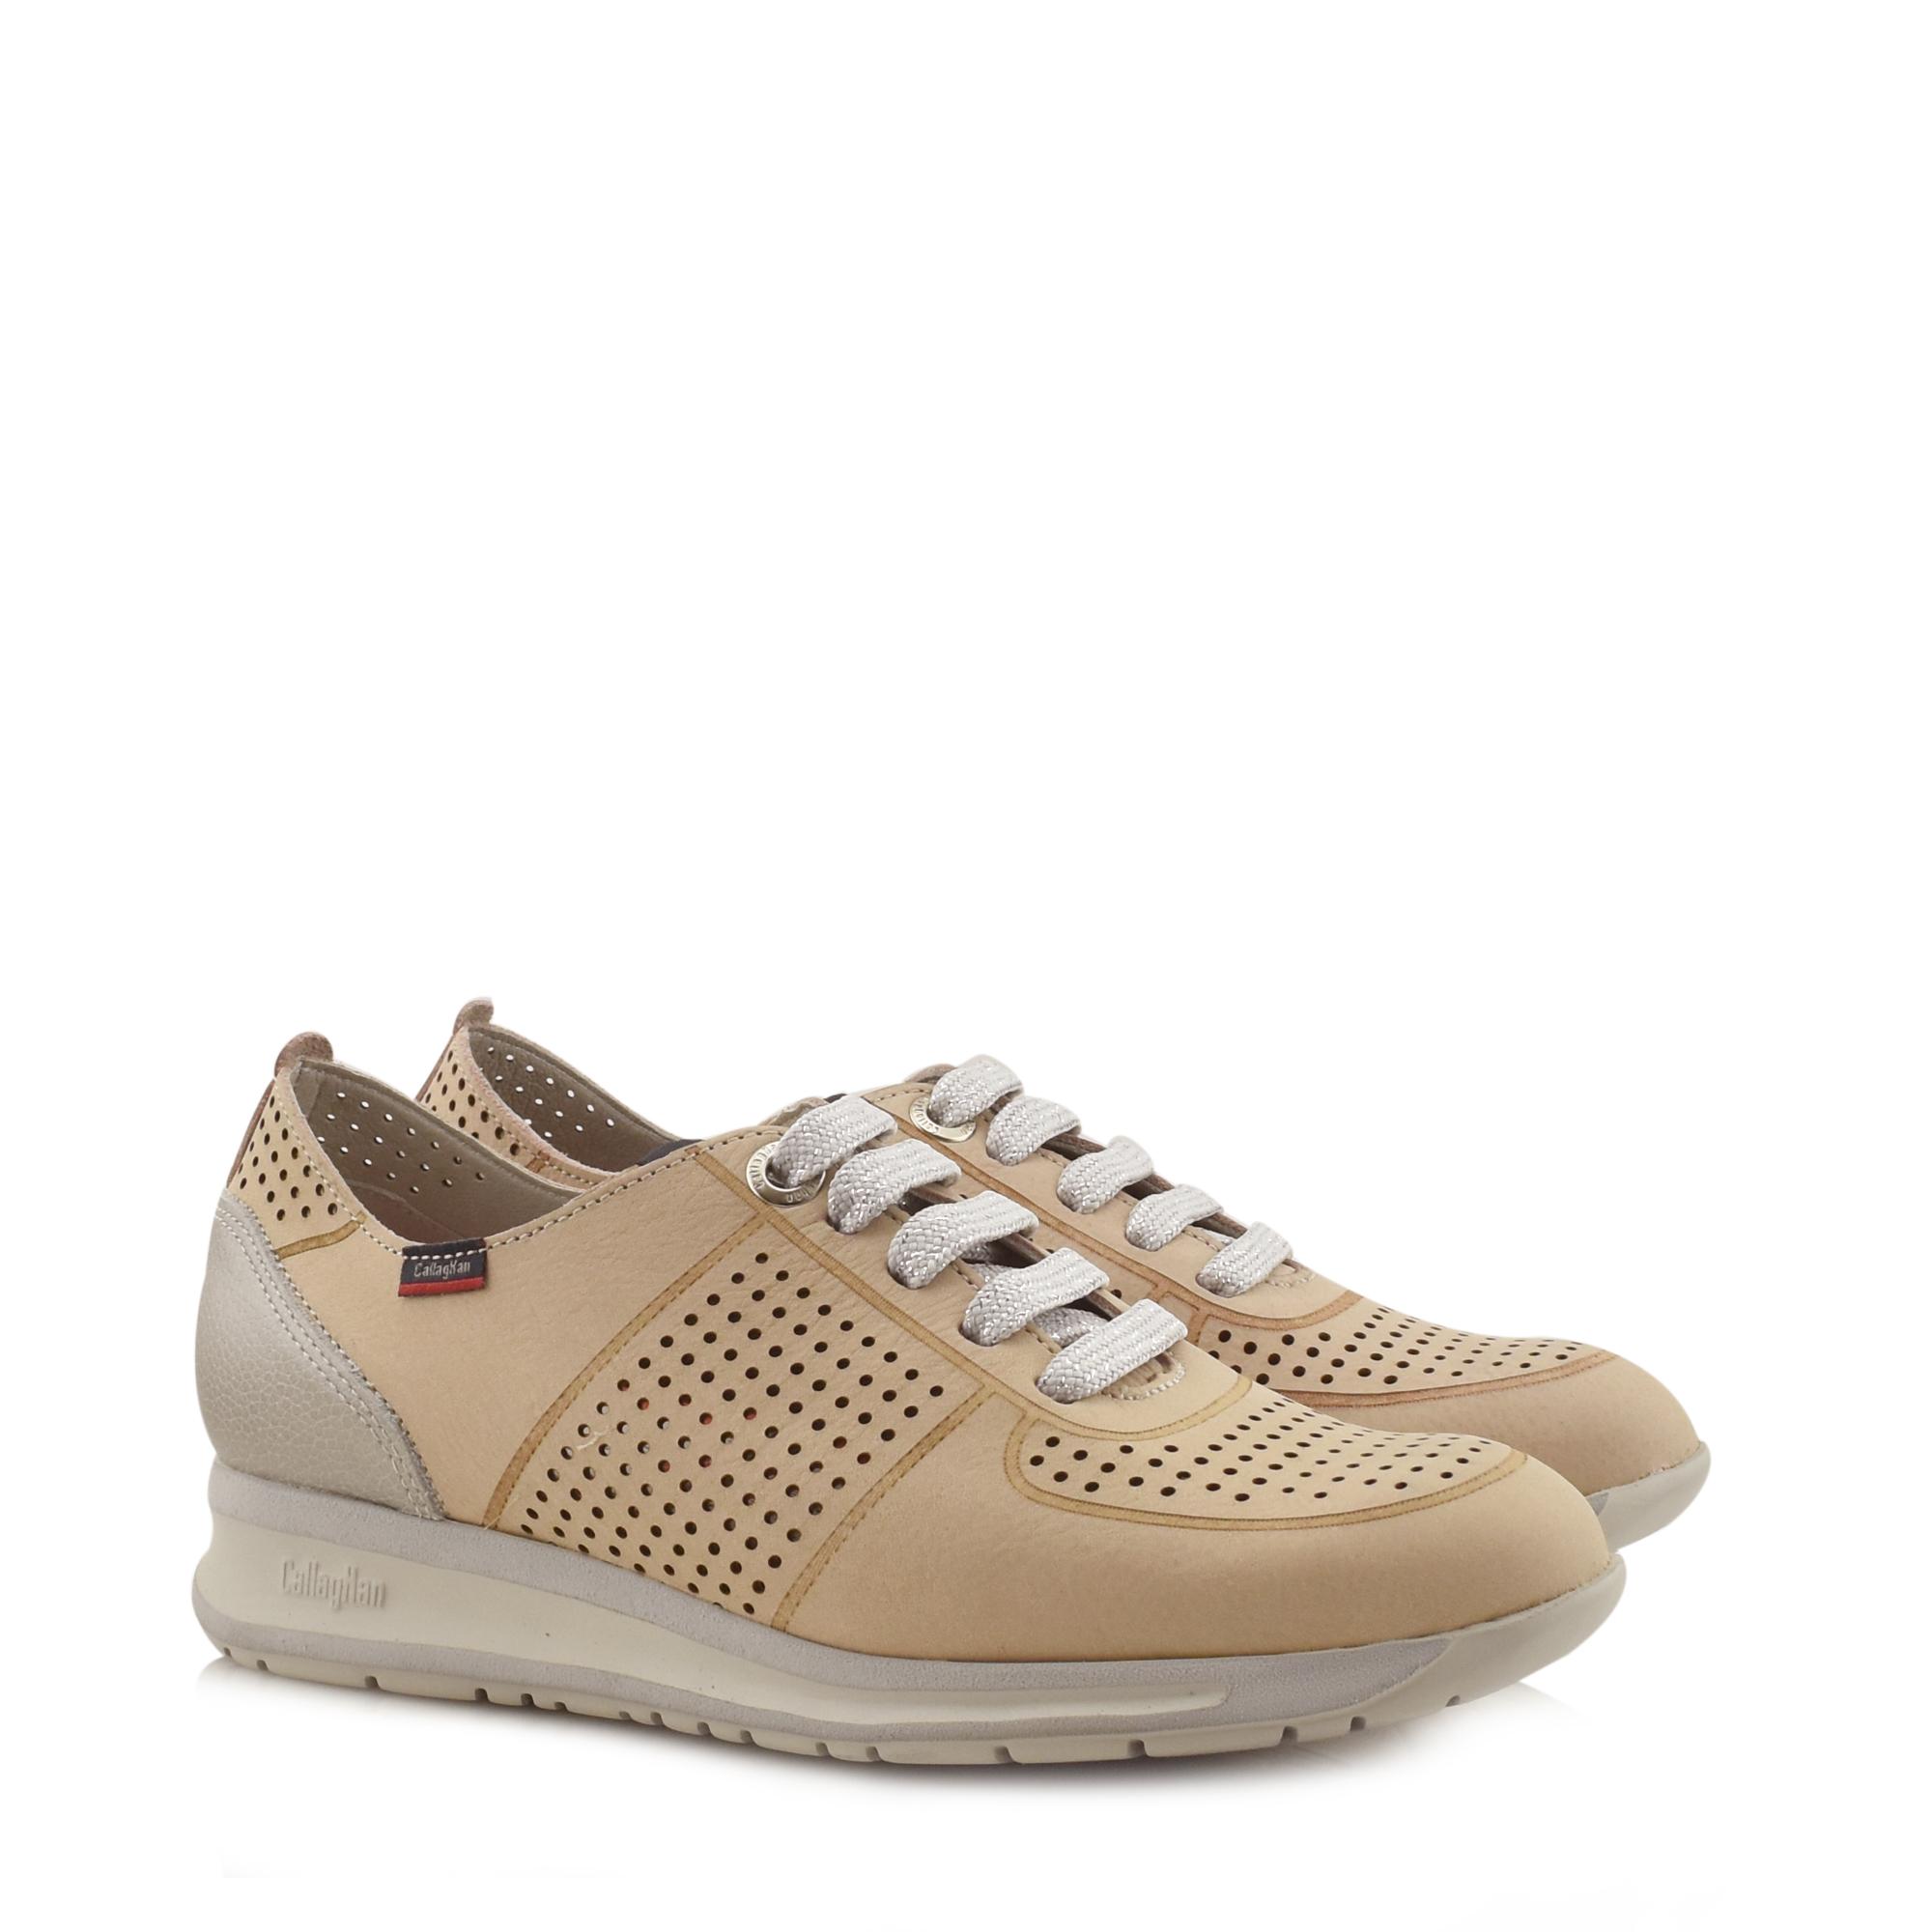 05e47e13f7 Γυναικεία Ανατομικά Παπούτσια (Ταξινόμηση  Ακριβότερα)